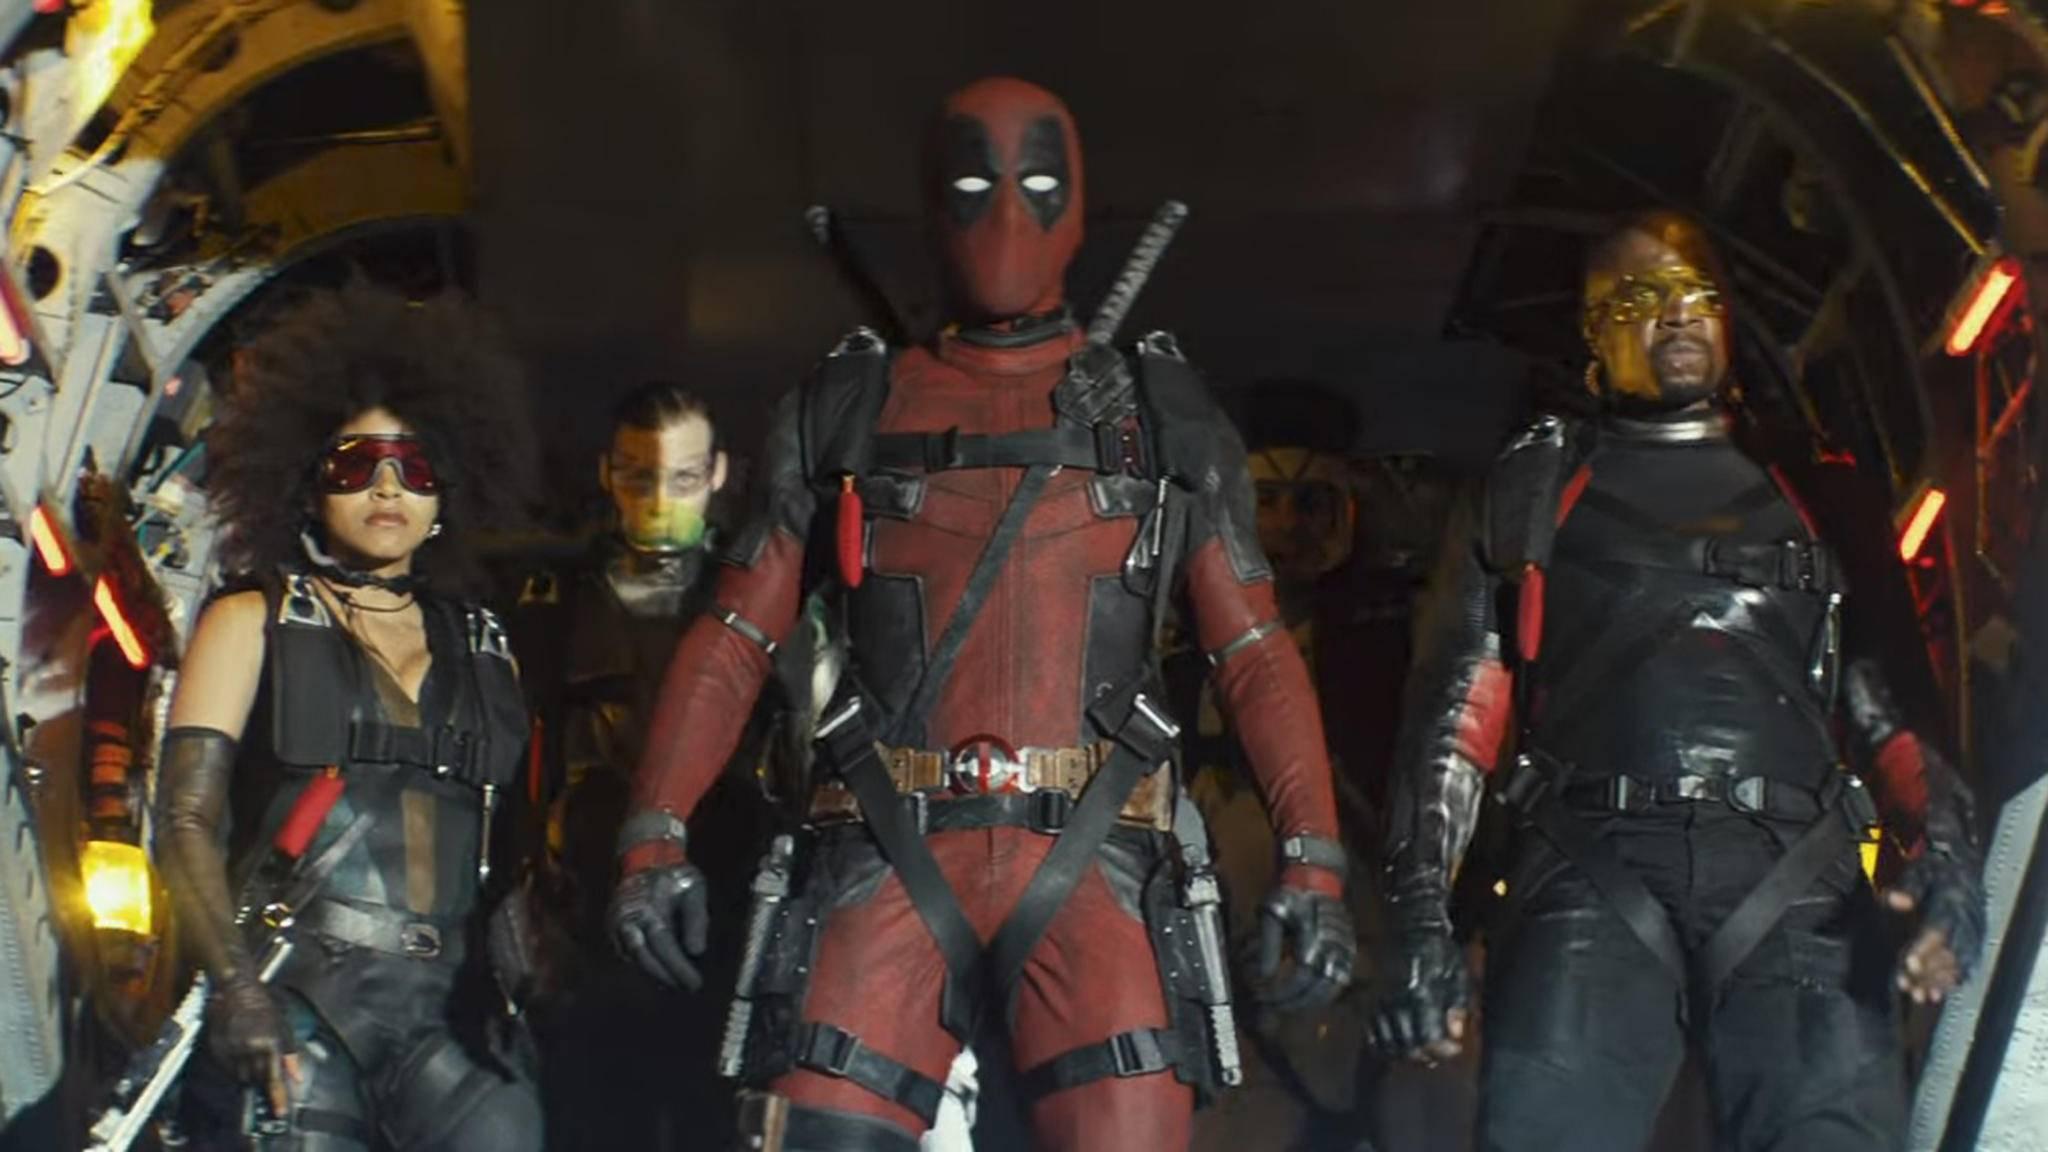 Avengers, nehmt euch in Acht! Deadpool ist auf Krawall aus.